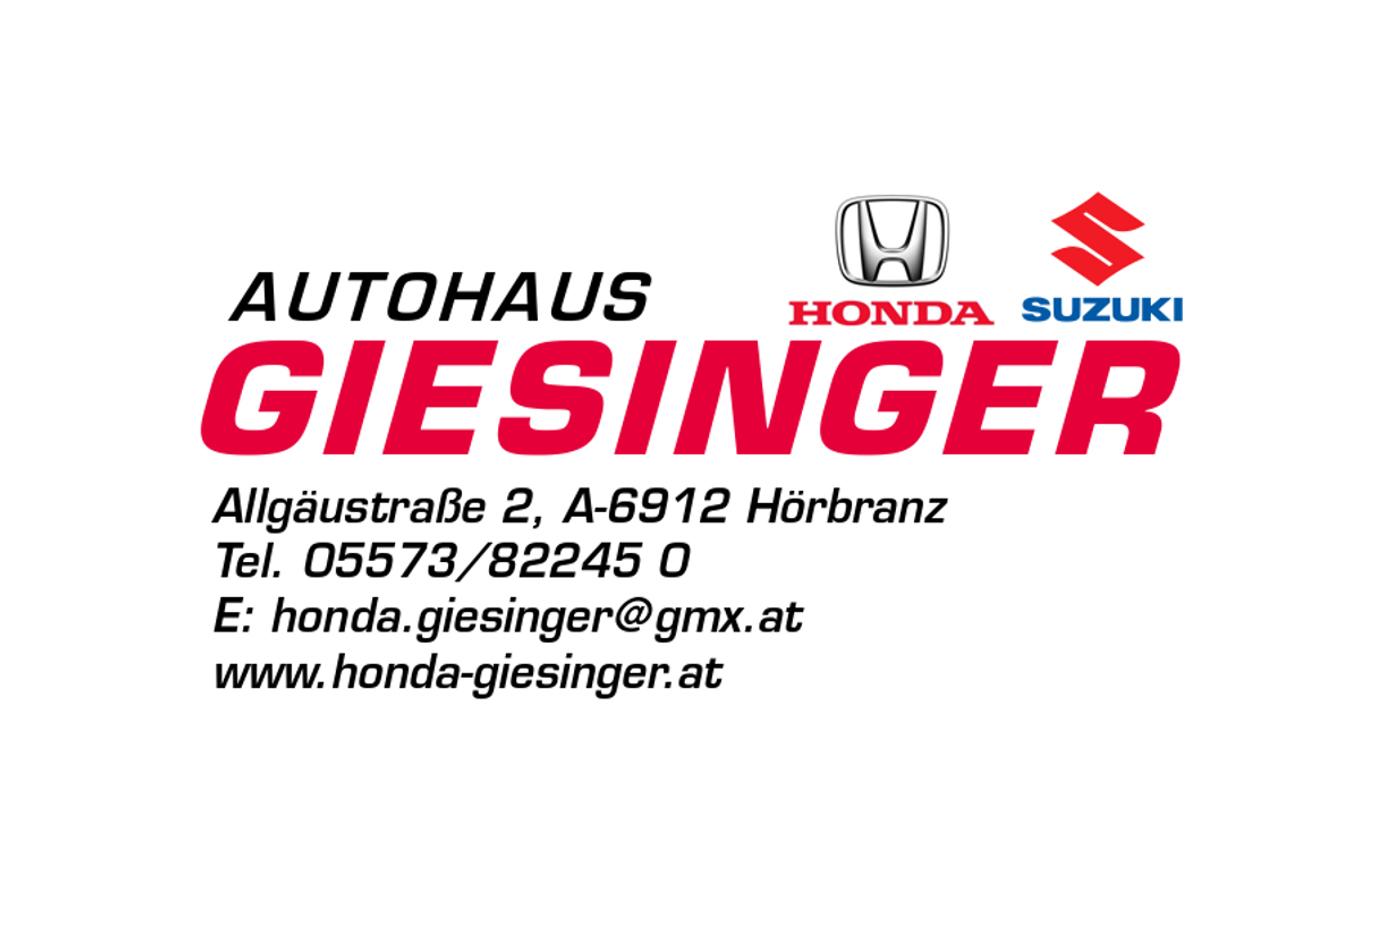 Autohaus Giesinger